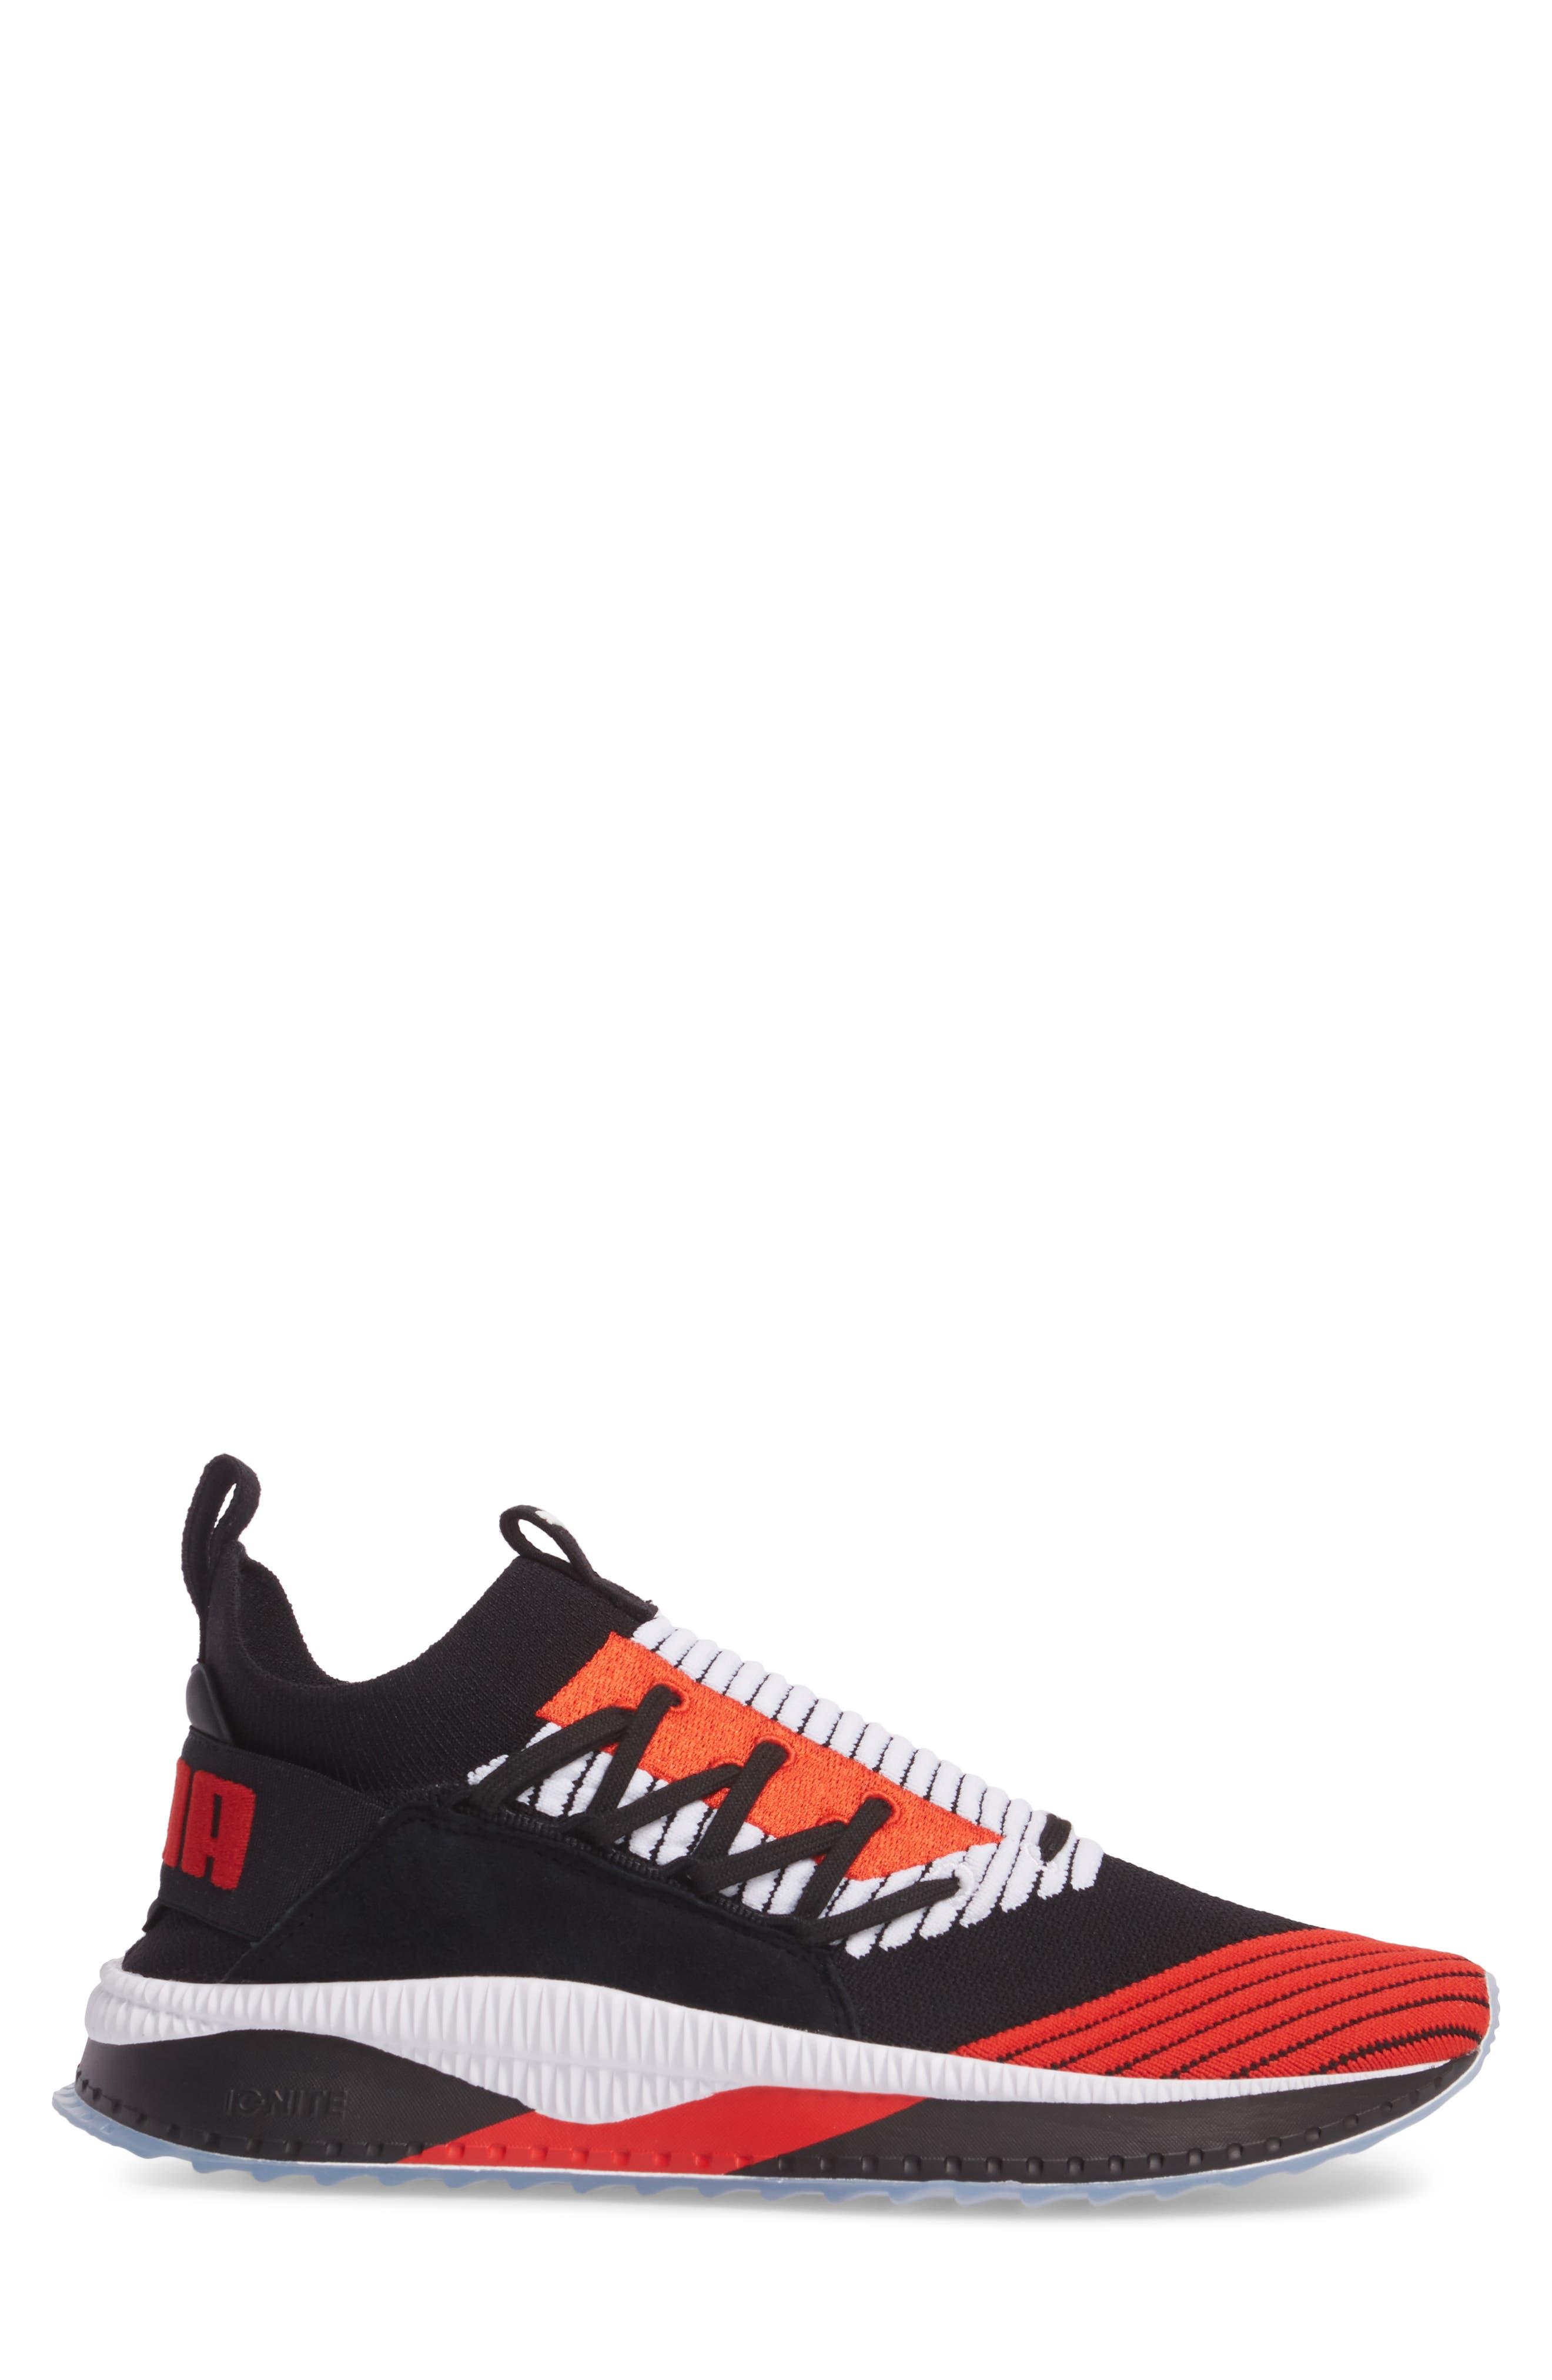 Tsugi Shinsei UT Odyssey Sneaker,                             Alternate thumbnail 3, color,                             Black/White/Flame Scarlet